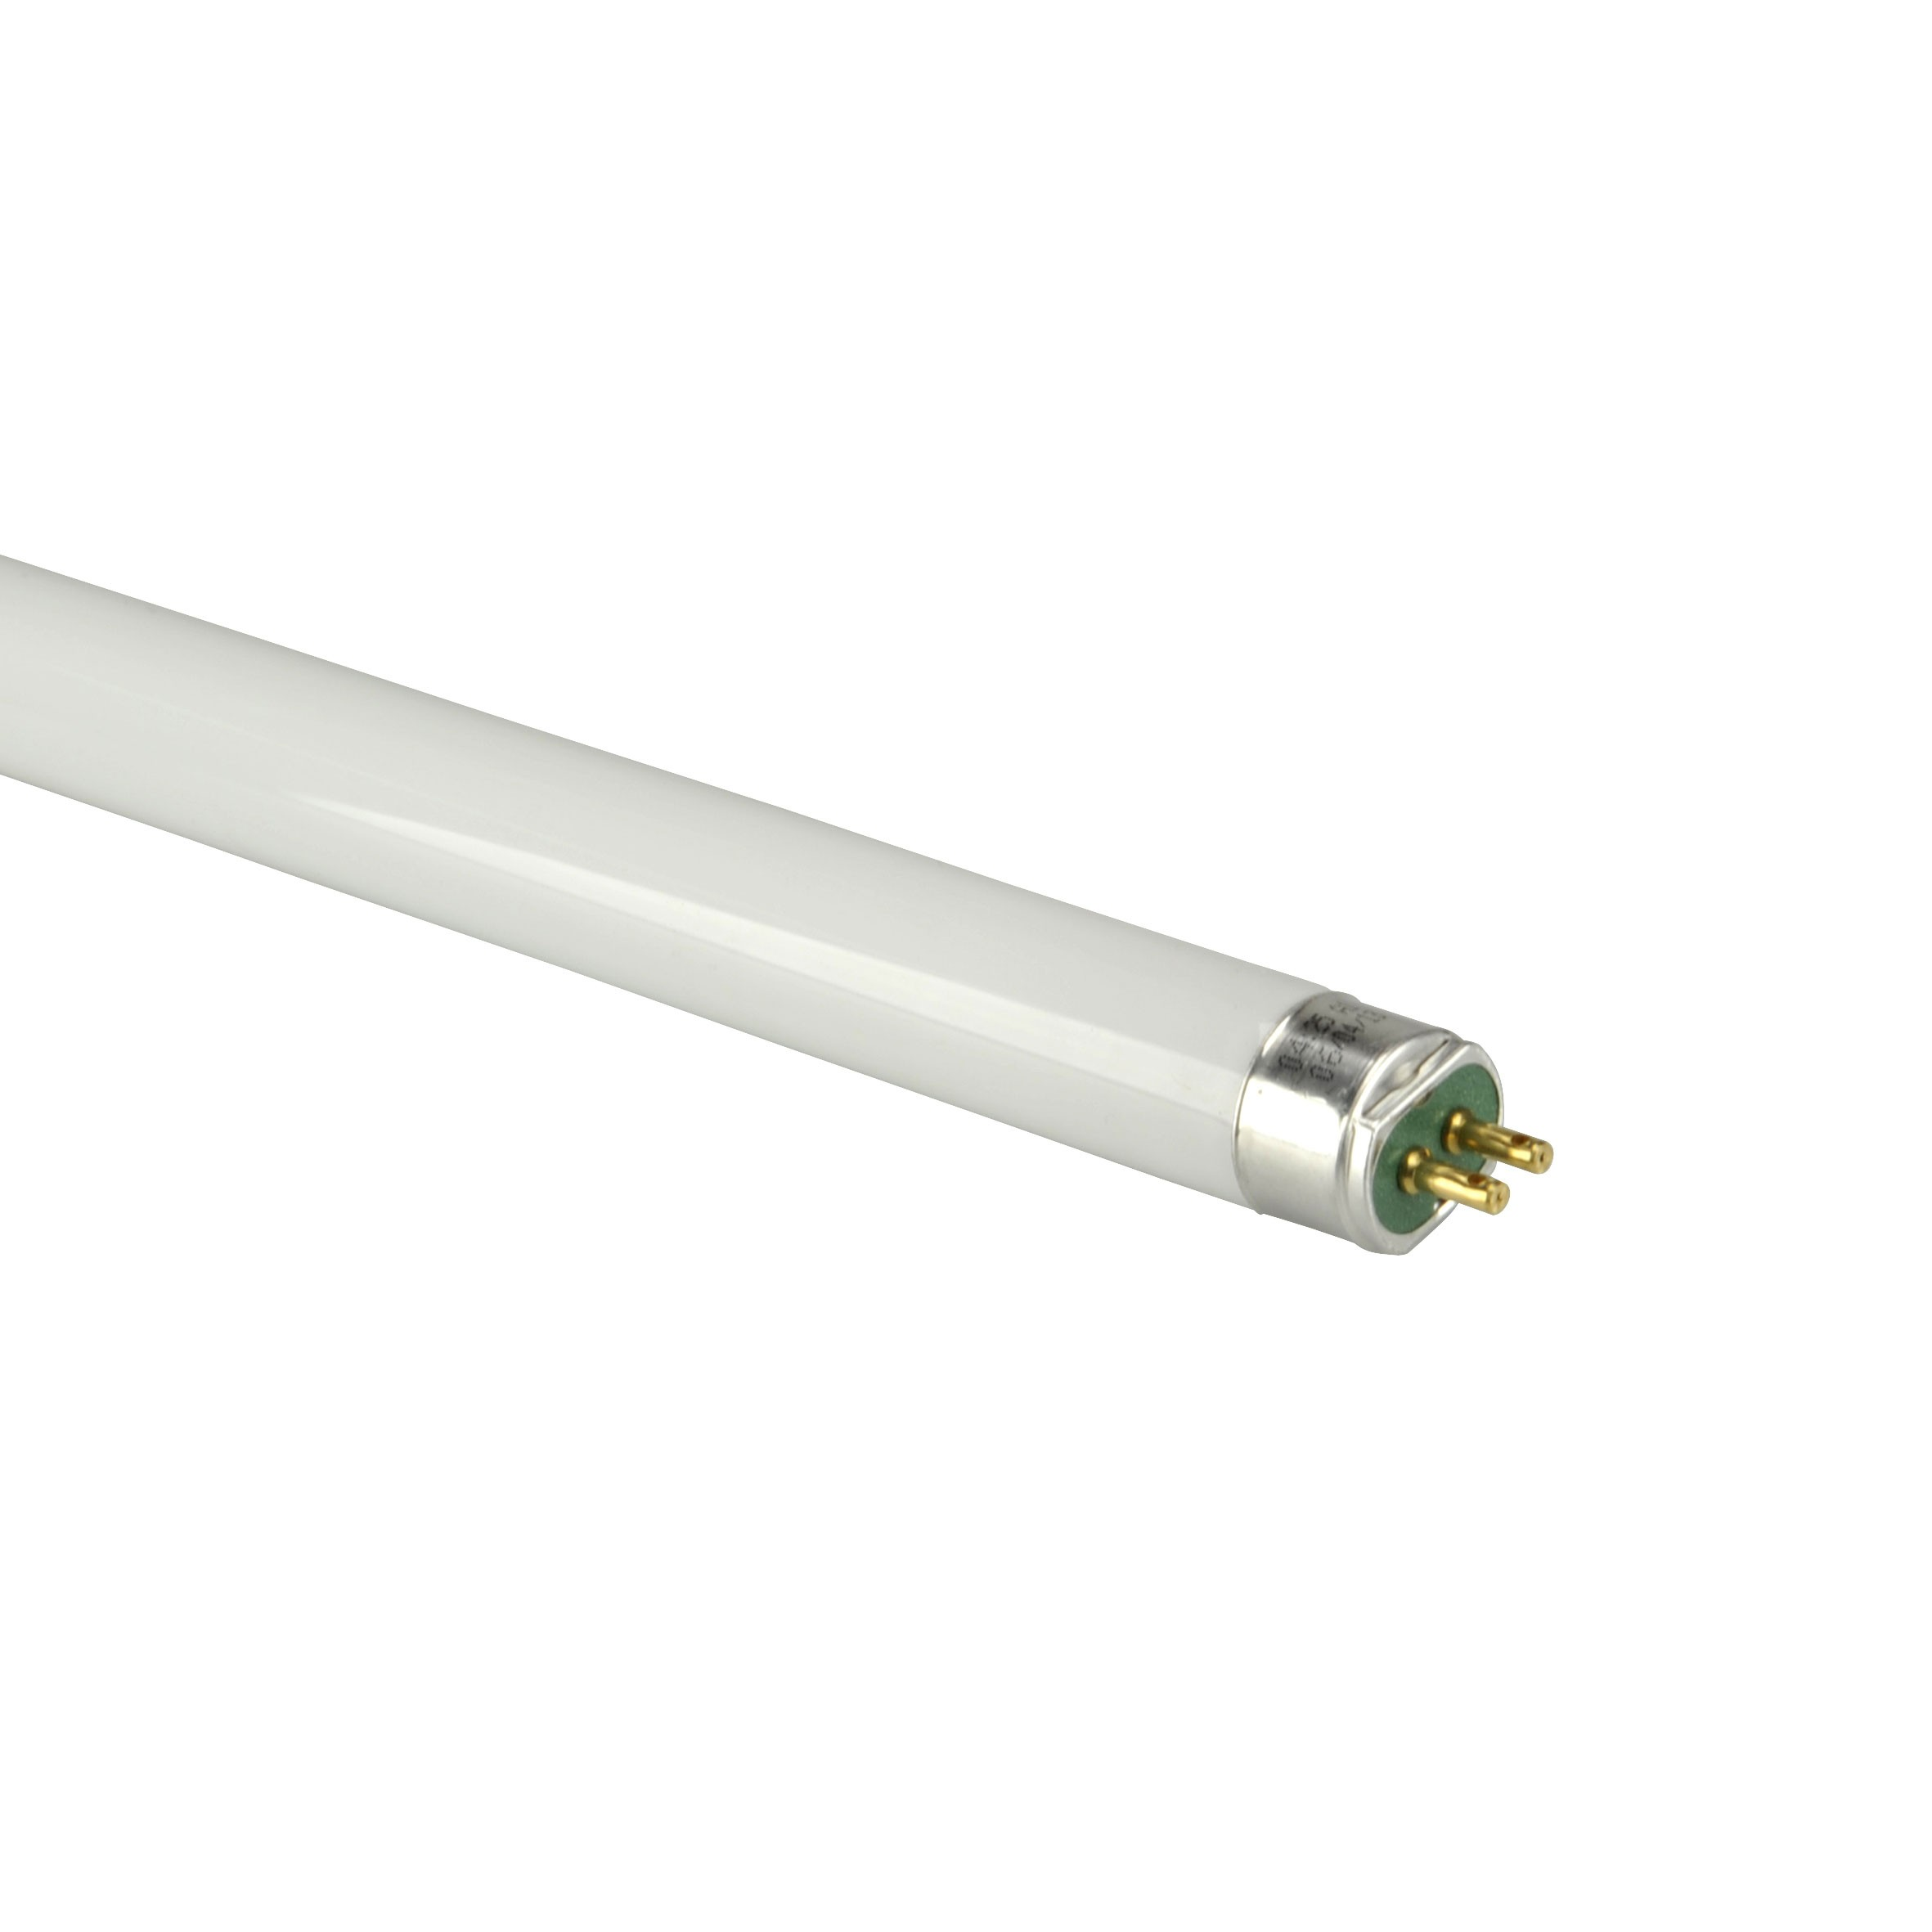 Philips Leuchtstoffröhre EcoTL Super 80 16W 827 dimmbar L 752mm Bild 1